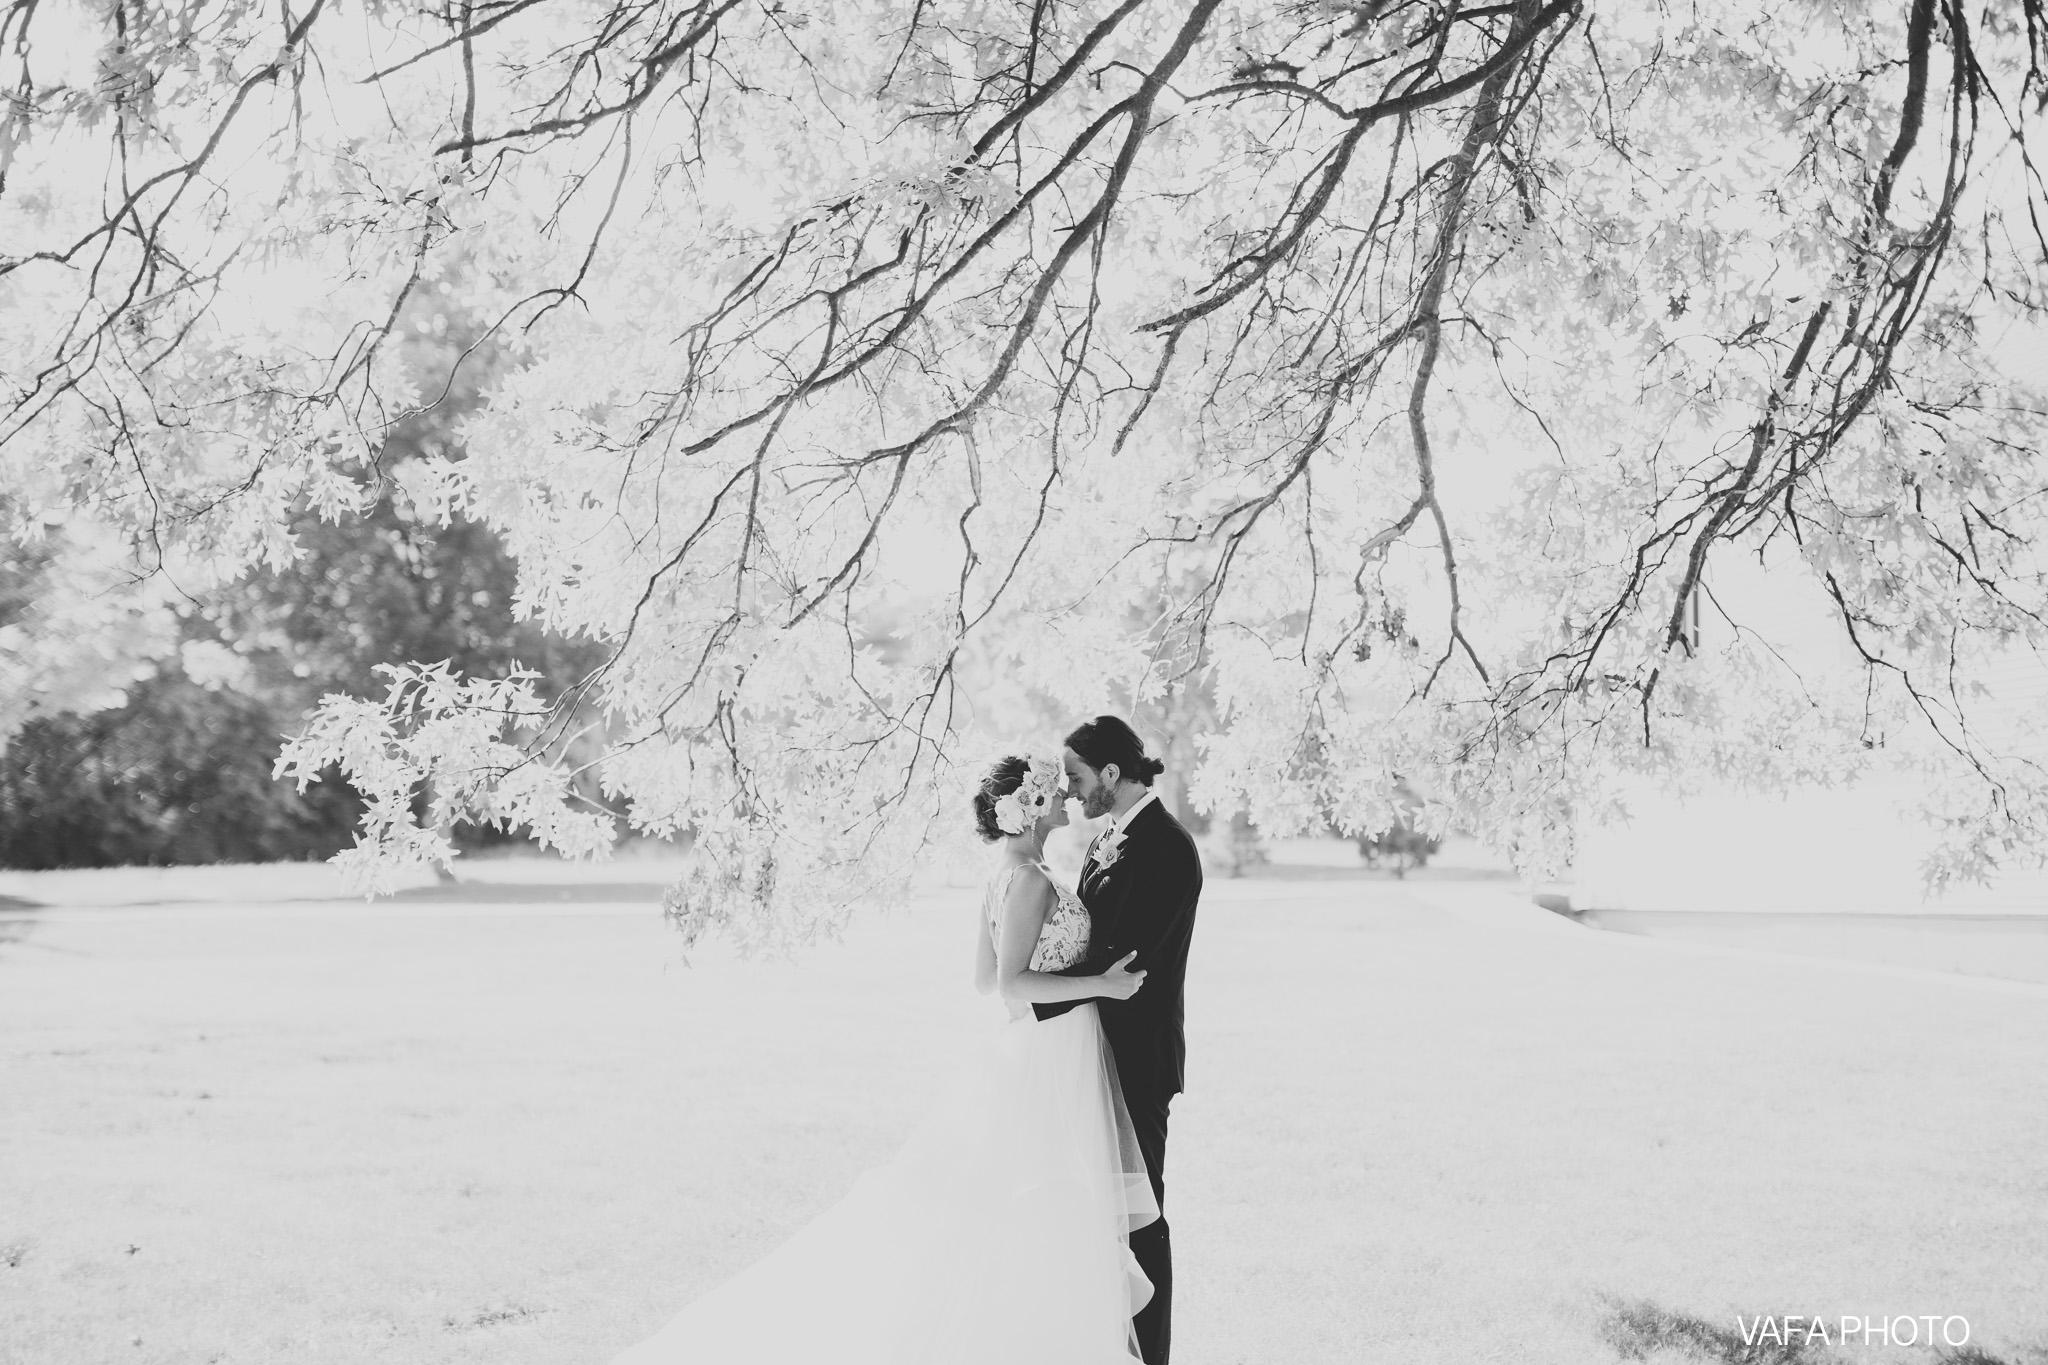 The-Felt-Estate-Wedding-Kailie-David-Vafa-Photo-558.jpg